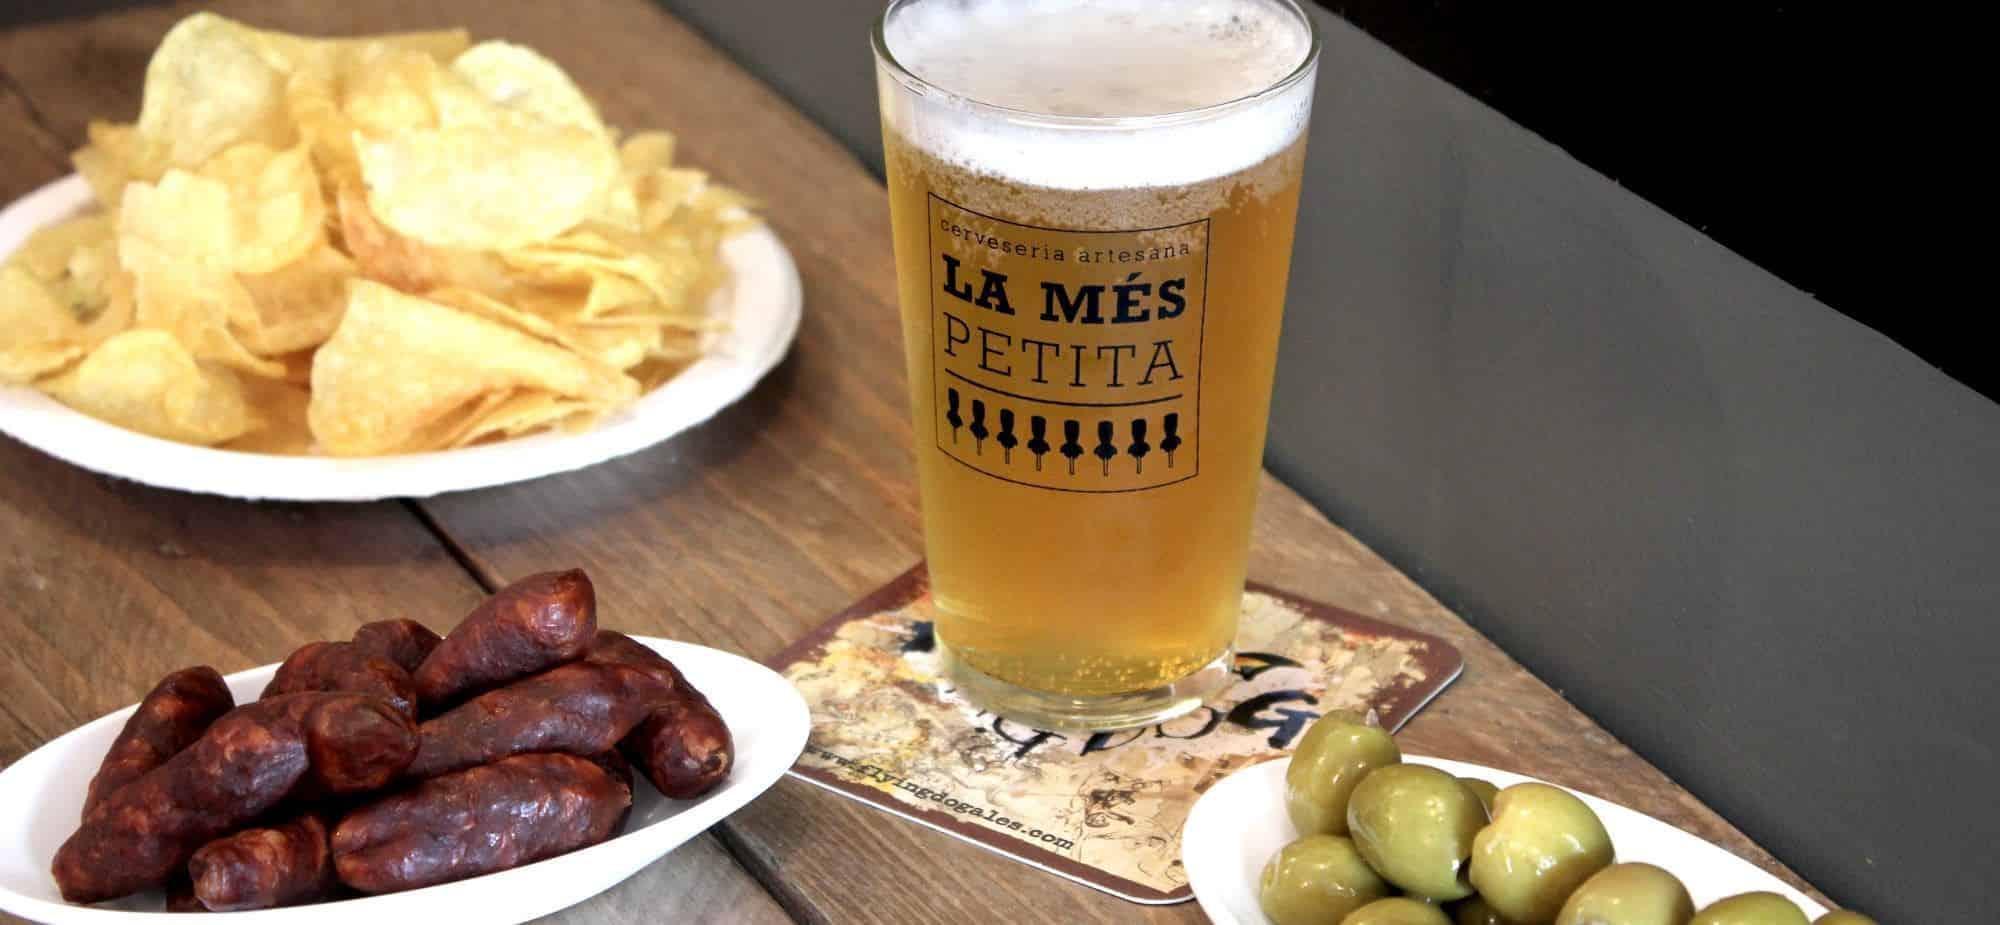 cerveseria-artesana-la-mes-petita-aperitiu-1-2000x925